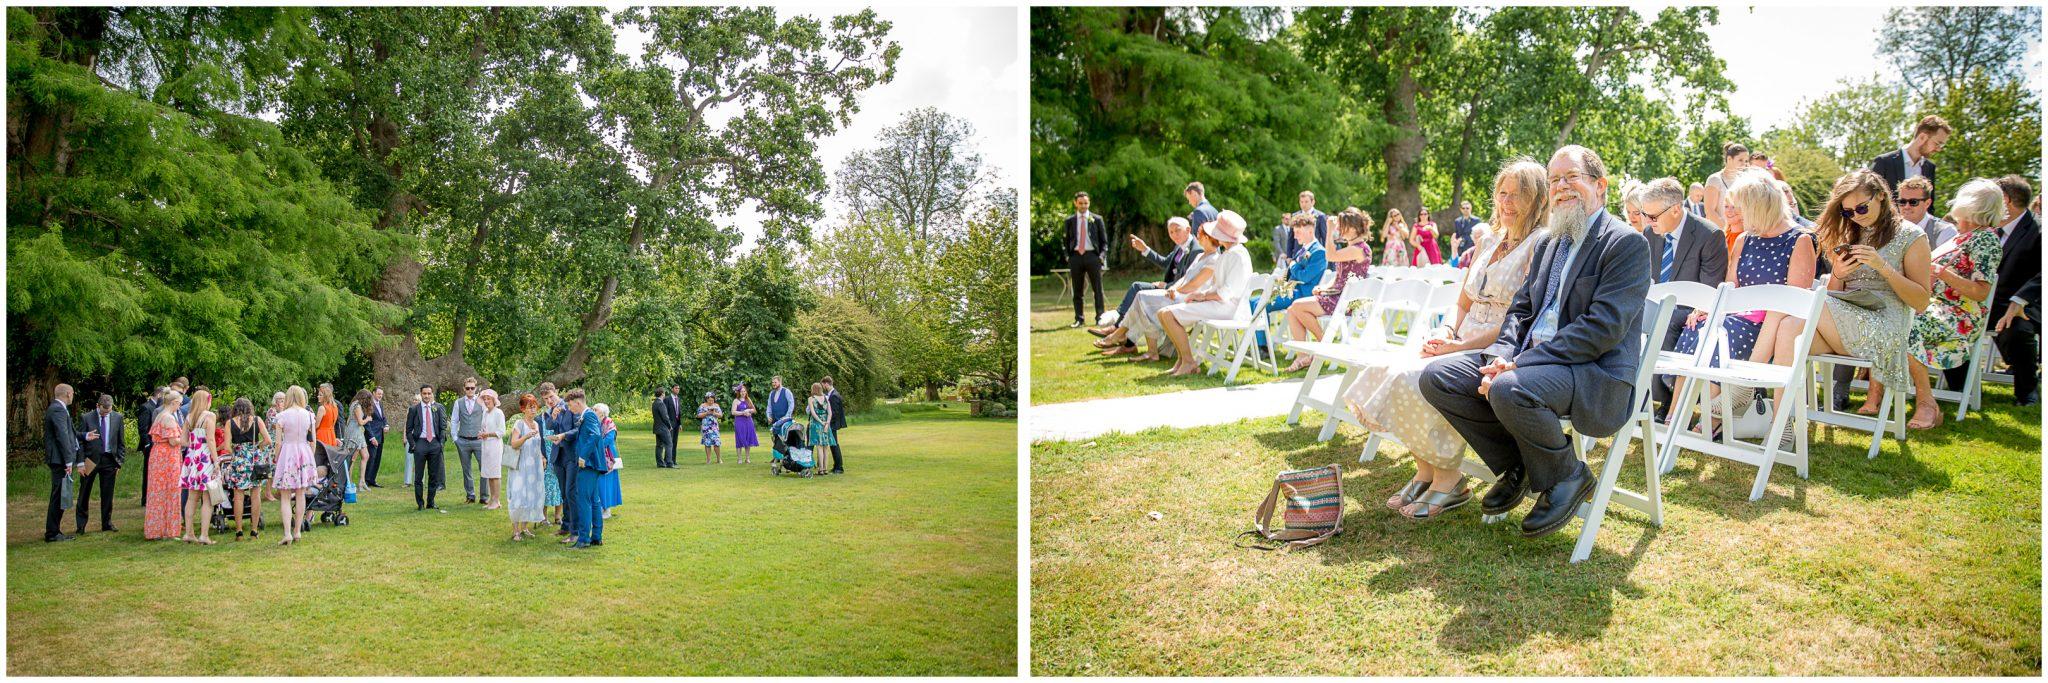 Wedding guests arrive